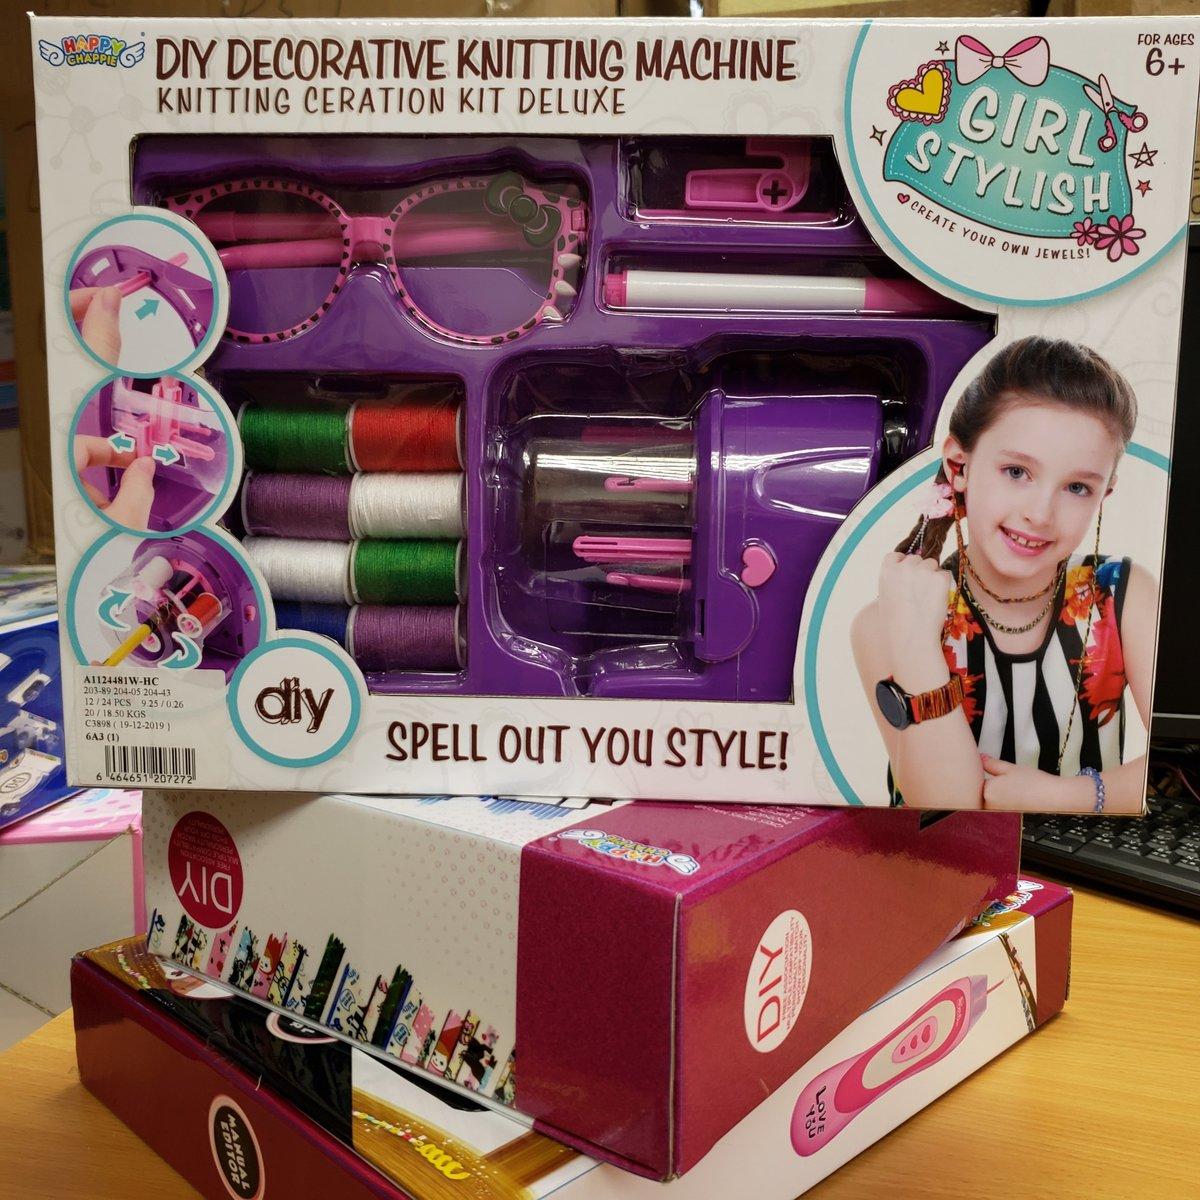 Toyslido 兒童 DIY 扮靚套裝 特價陳列樣辦玩具